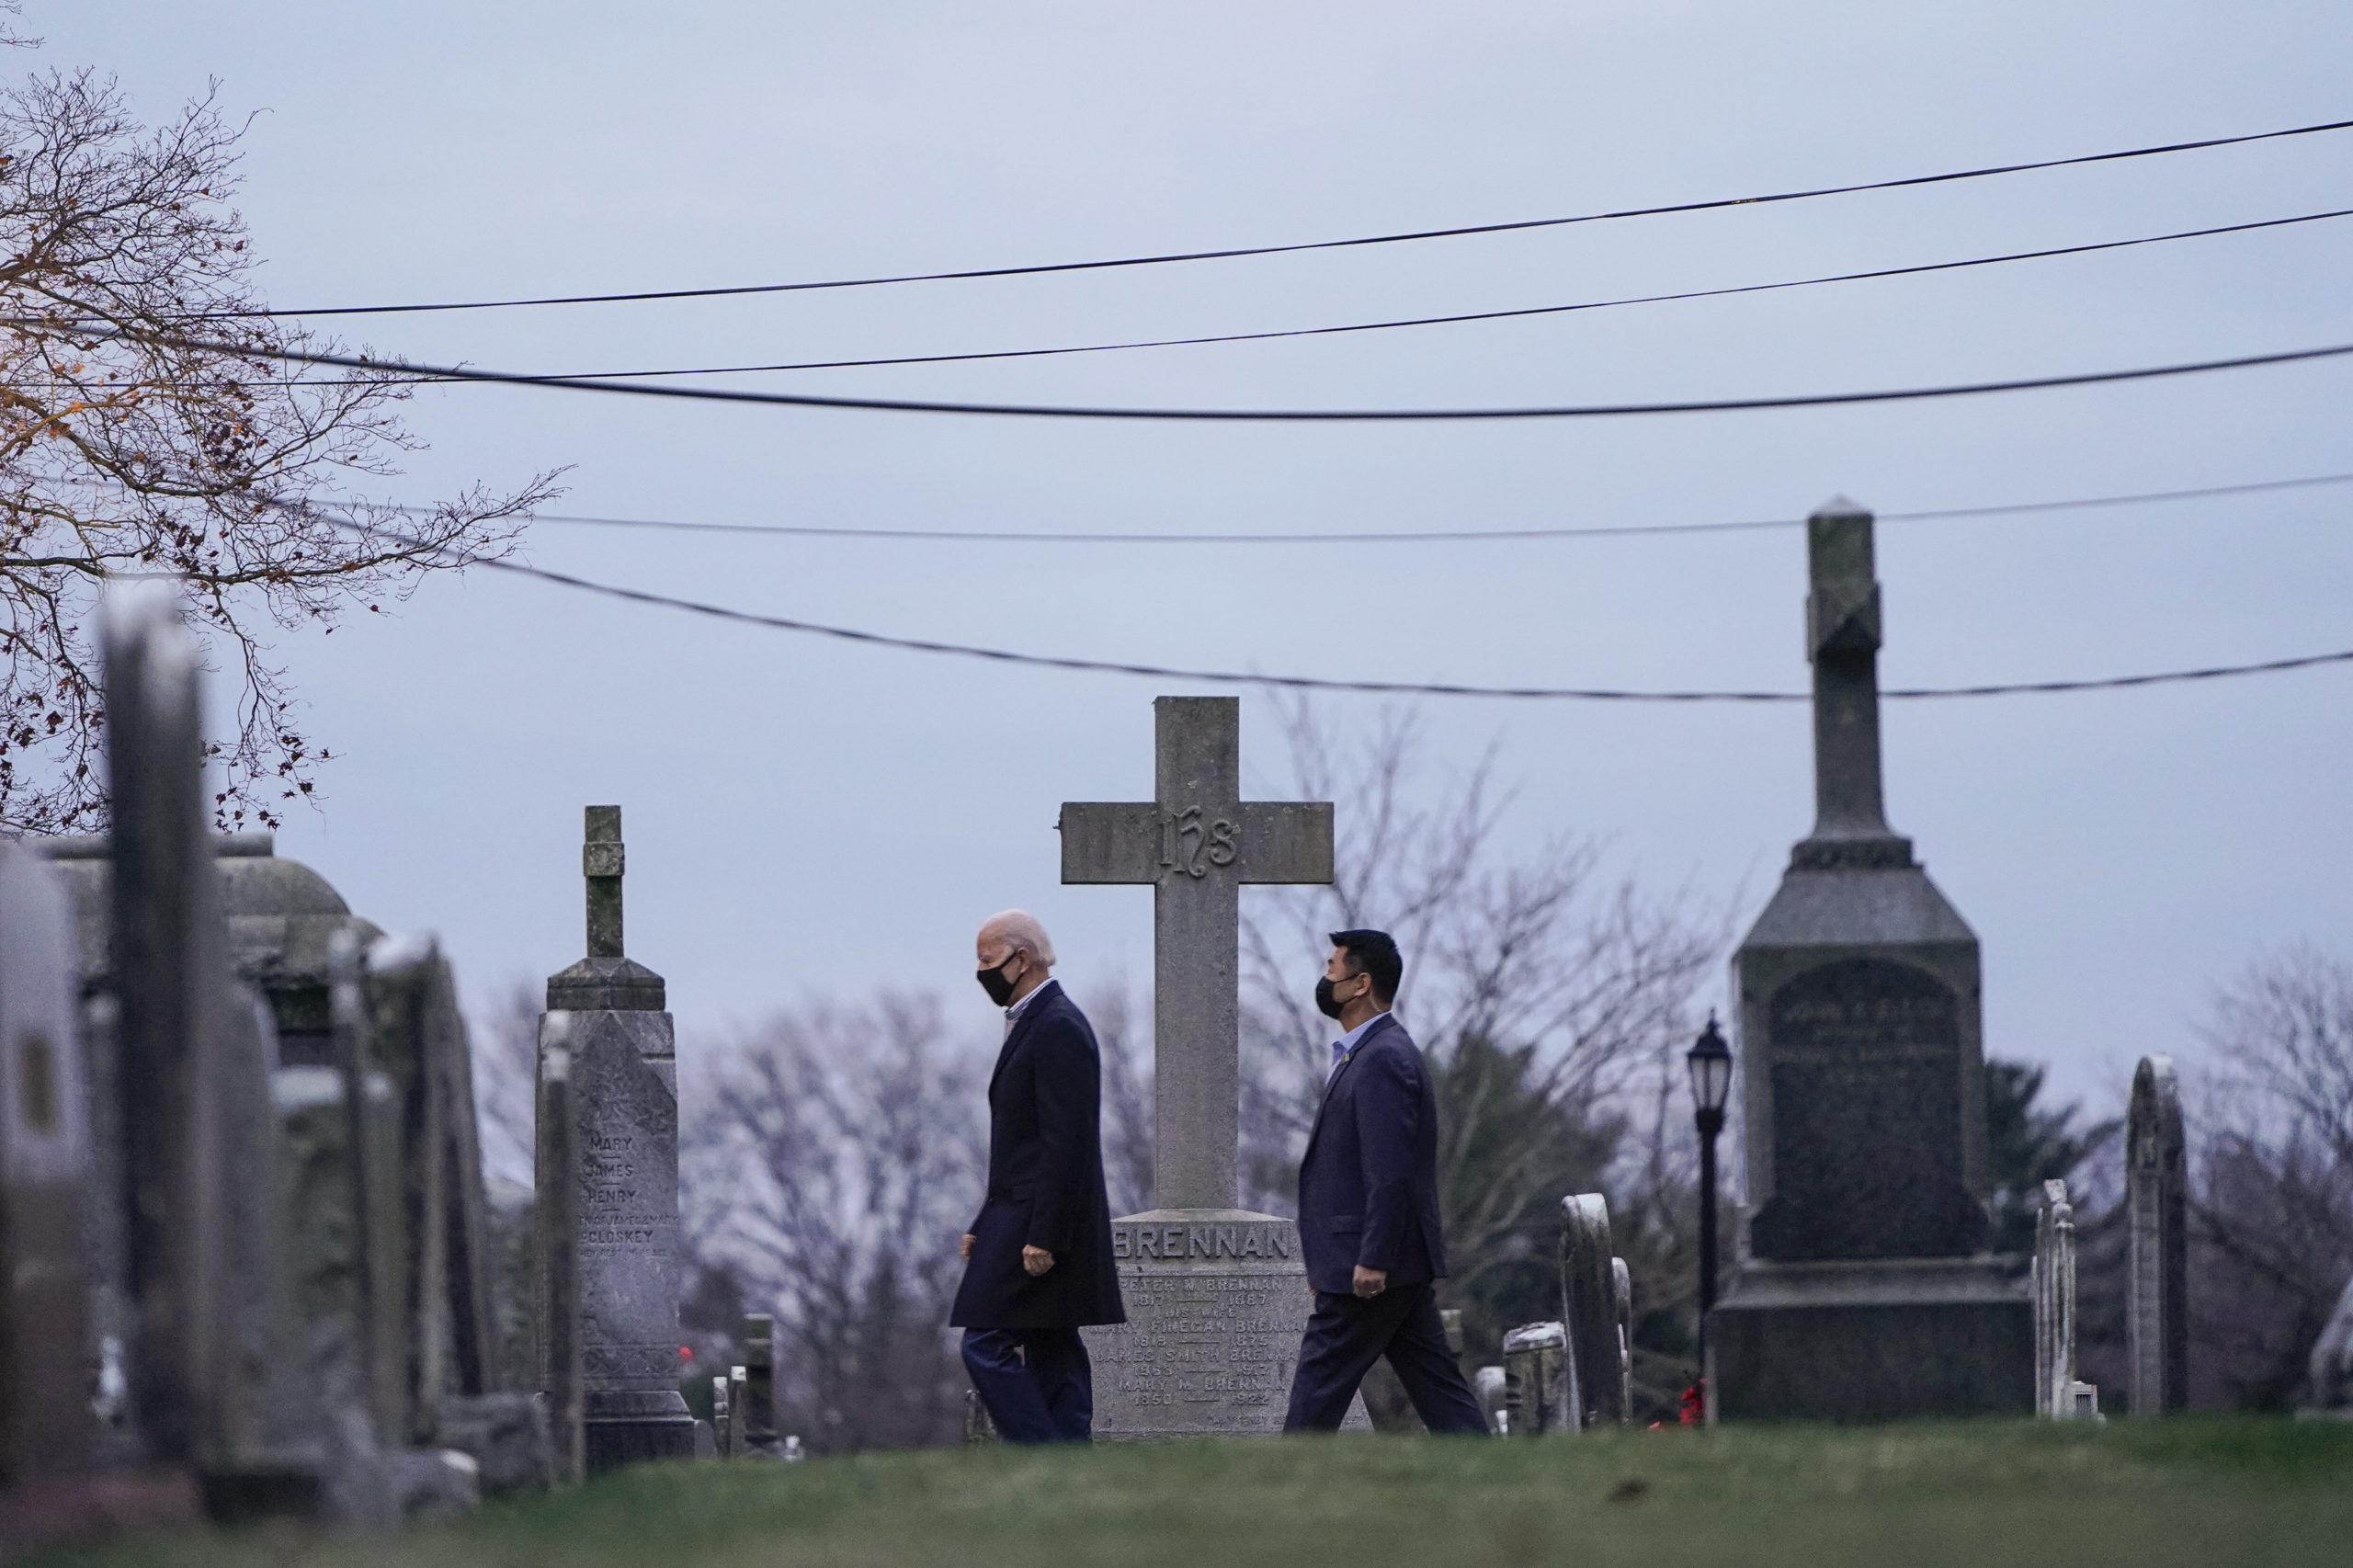 President Joe Biden is followed by Secret Service agents as he departs after Mass in Wilmington, Delaware in December. (Joshua Roberts/Getty Images)